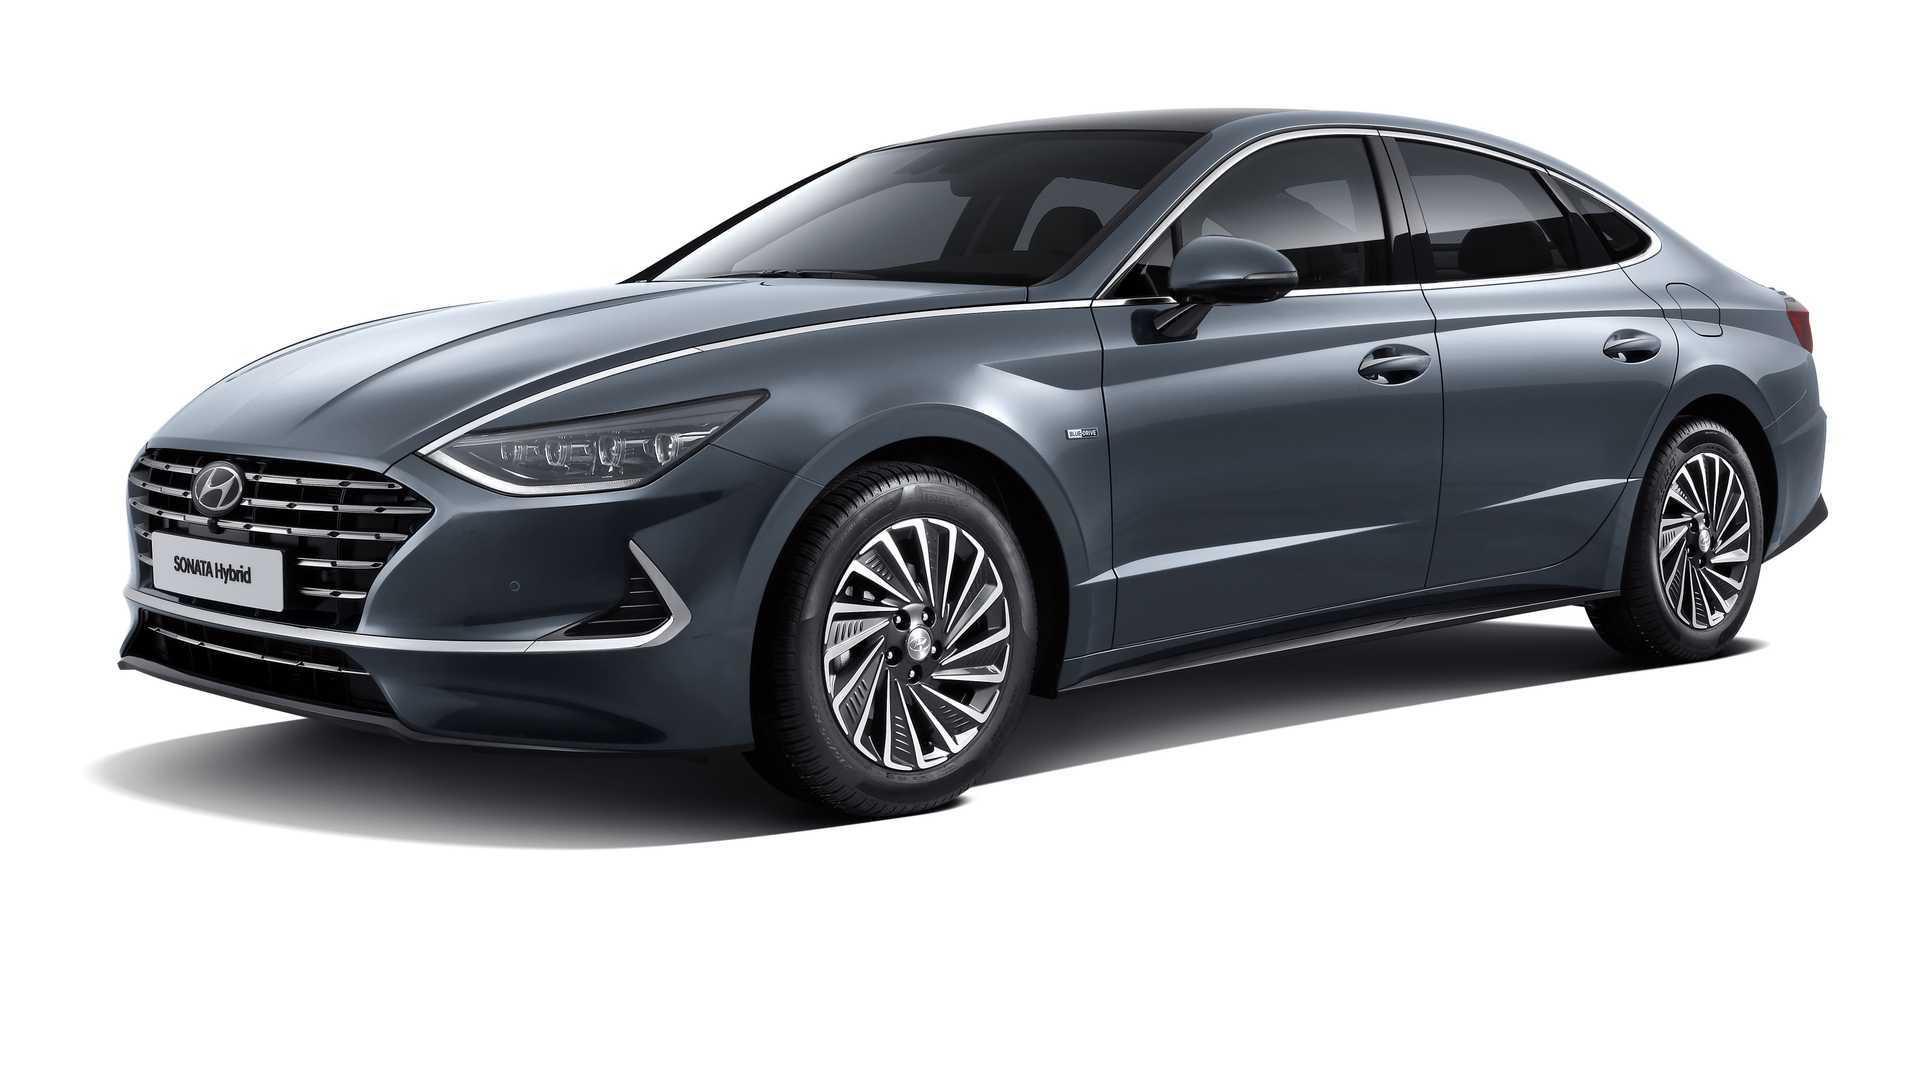 2020 Hyundai Sonata Hybrid New Concept